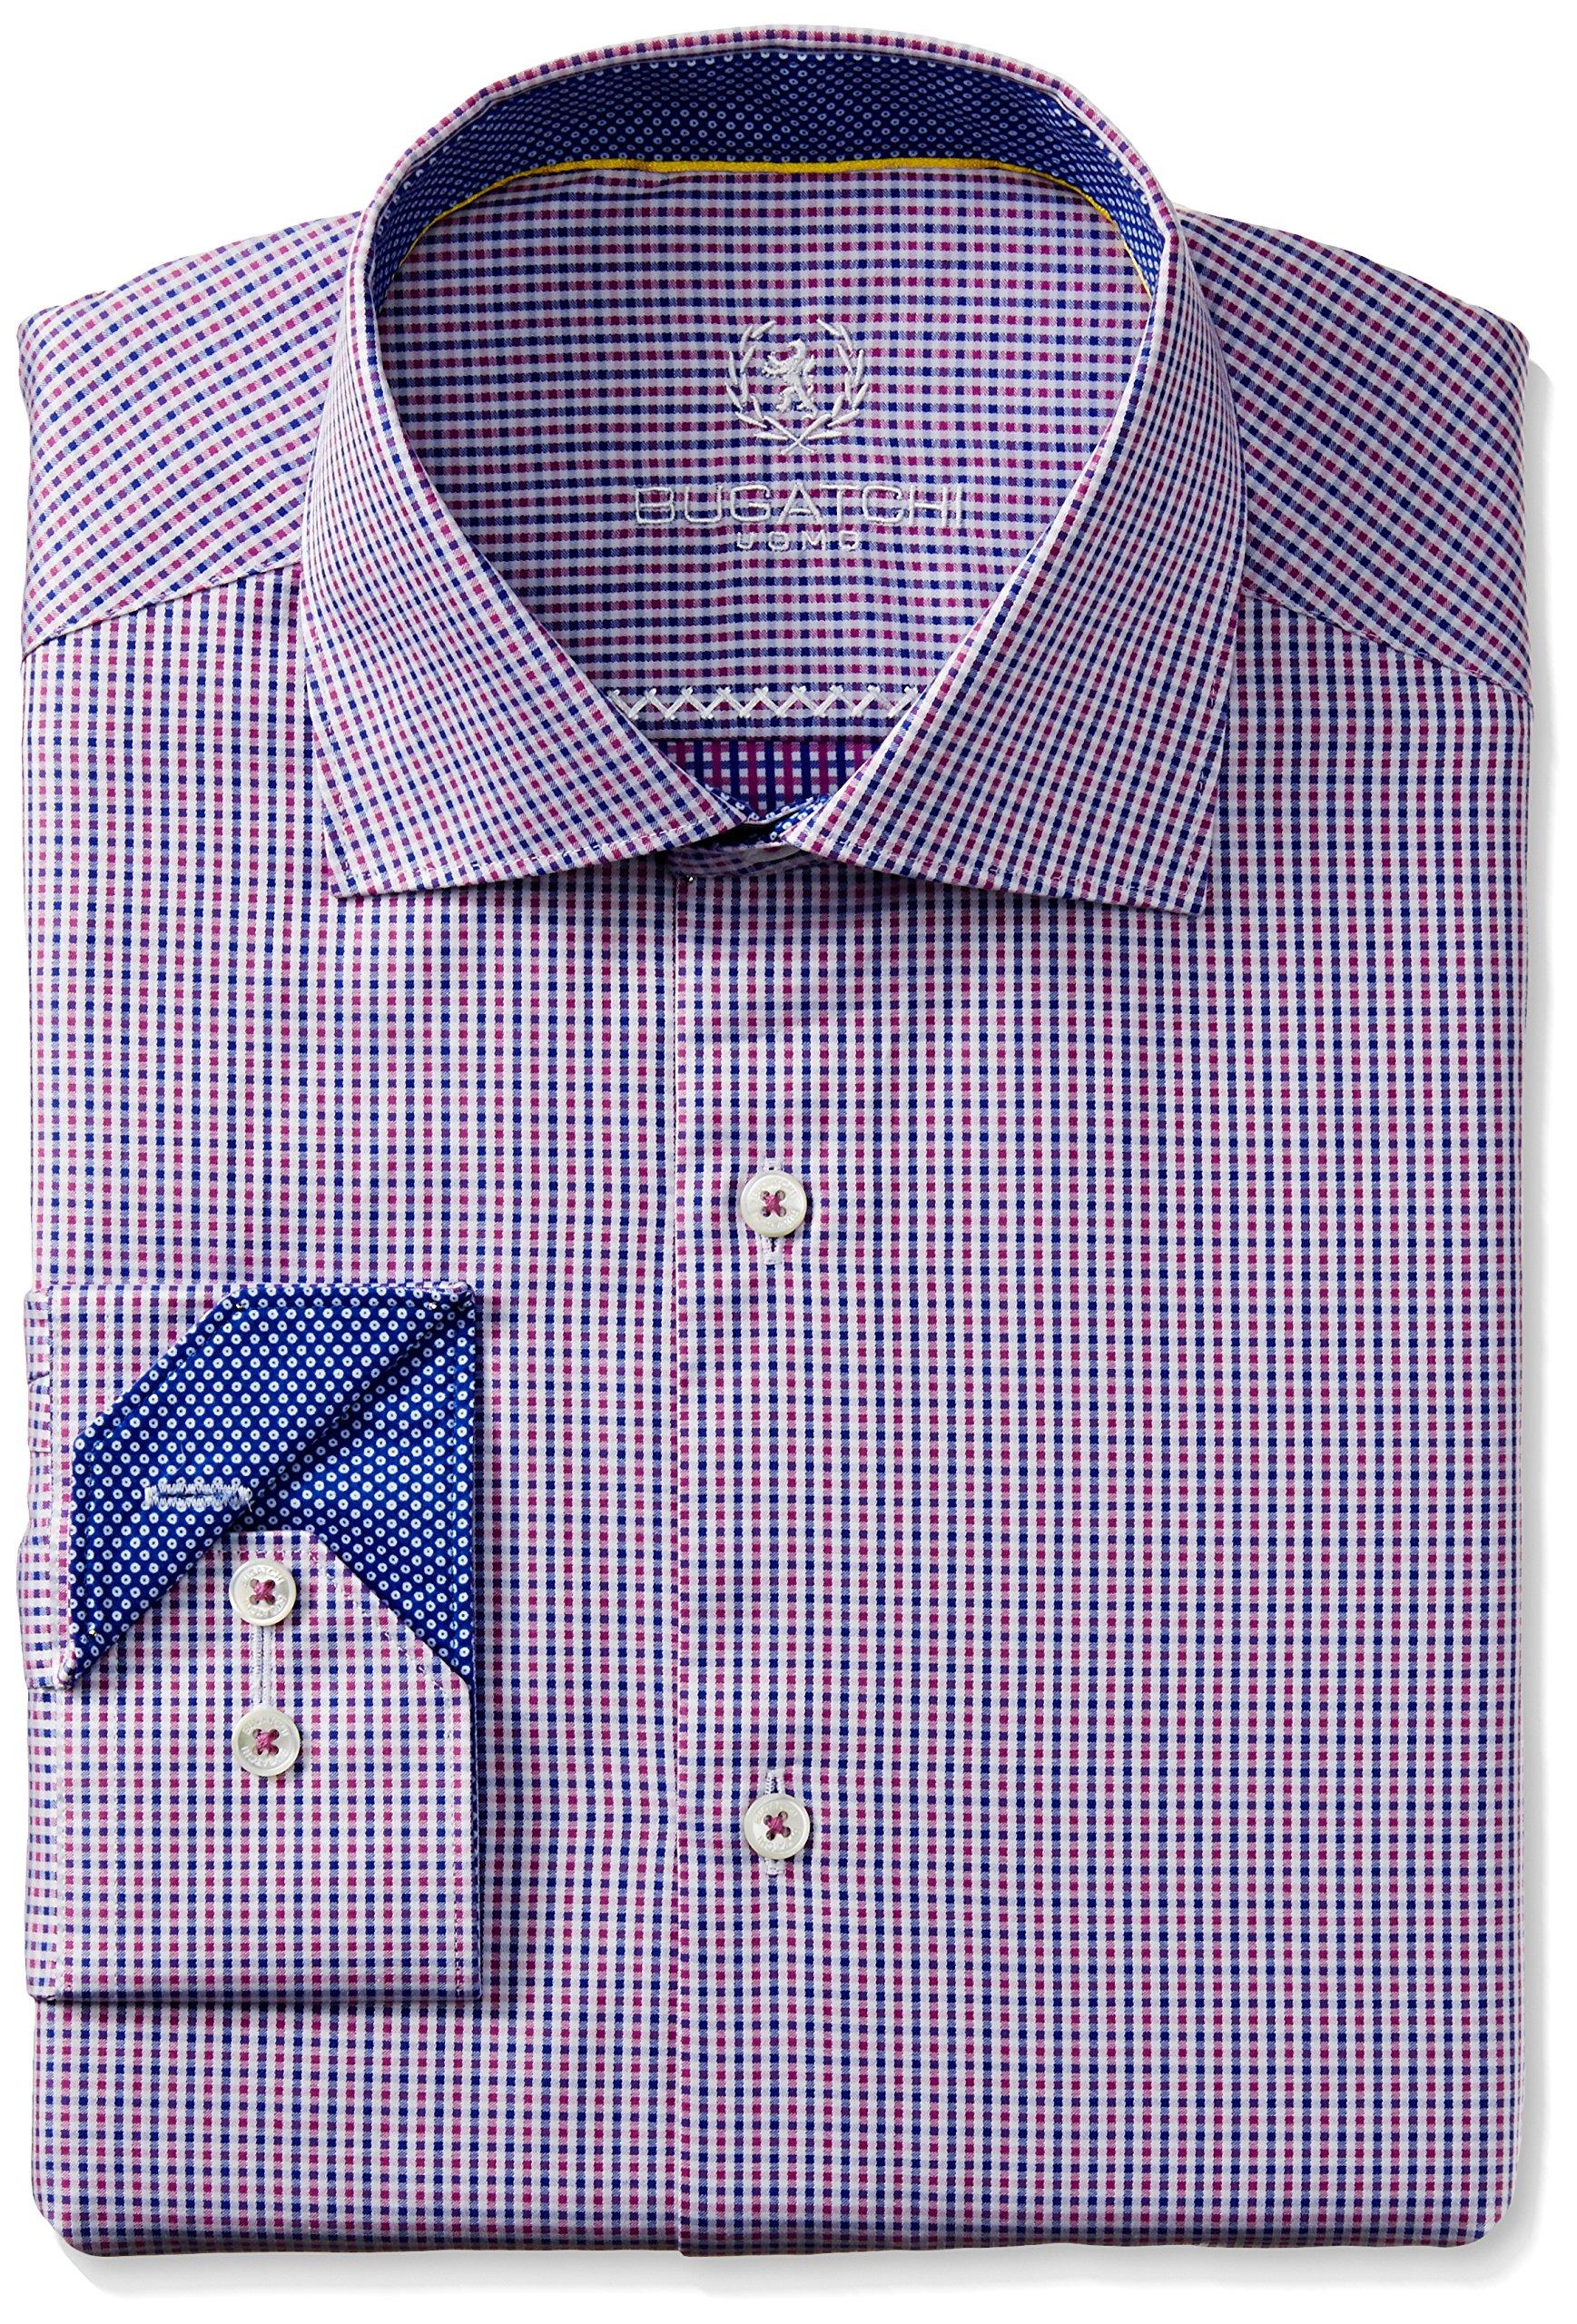 Bugatchi Men's Poli Dress Shirt, Pink, 17.5